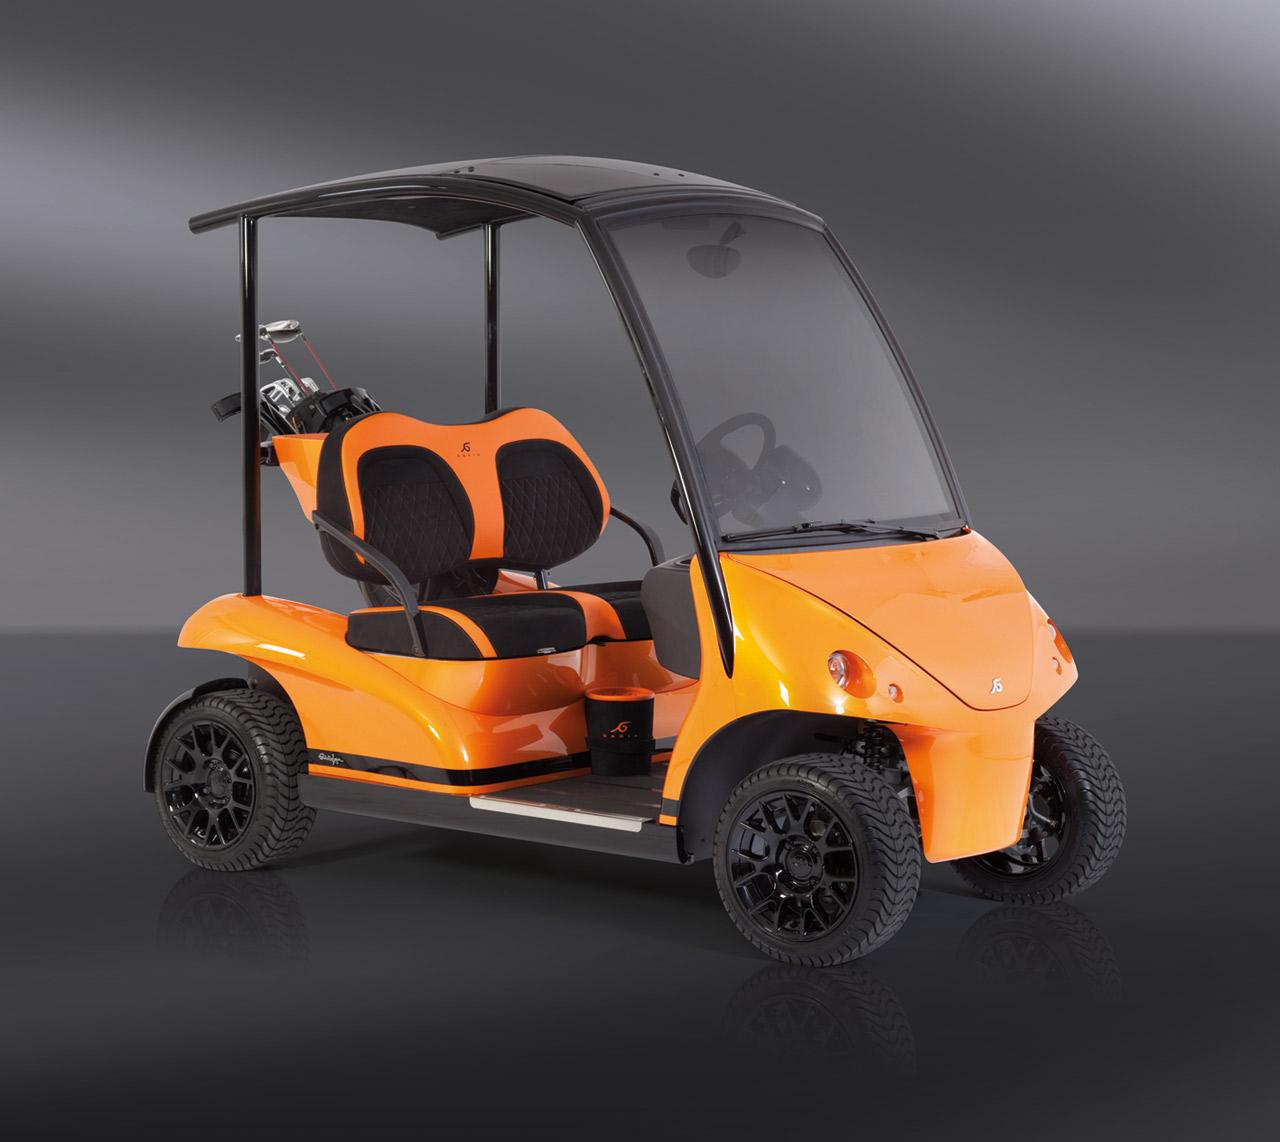 Hyundai Golf Cart Wiring Diagram Share The Knownledge